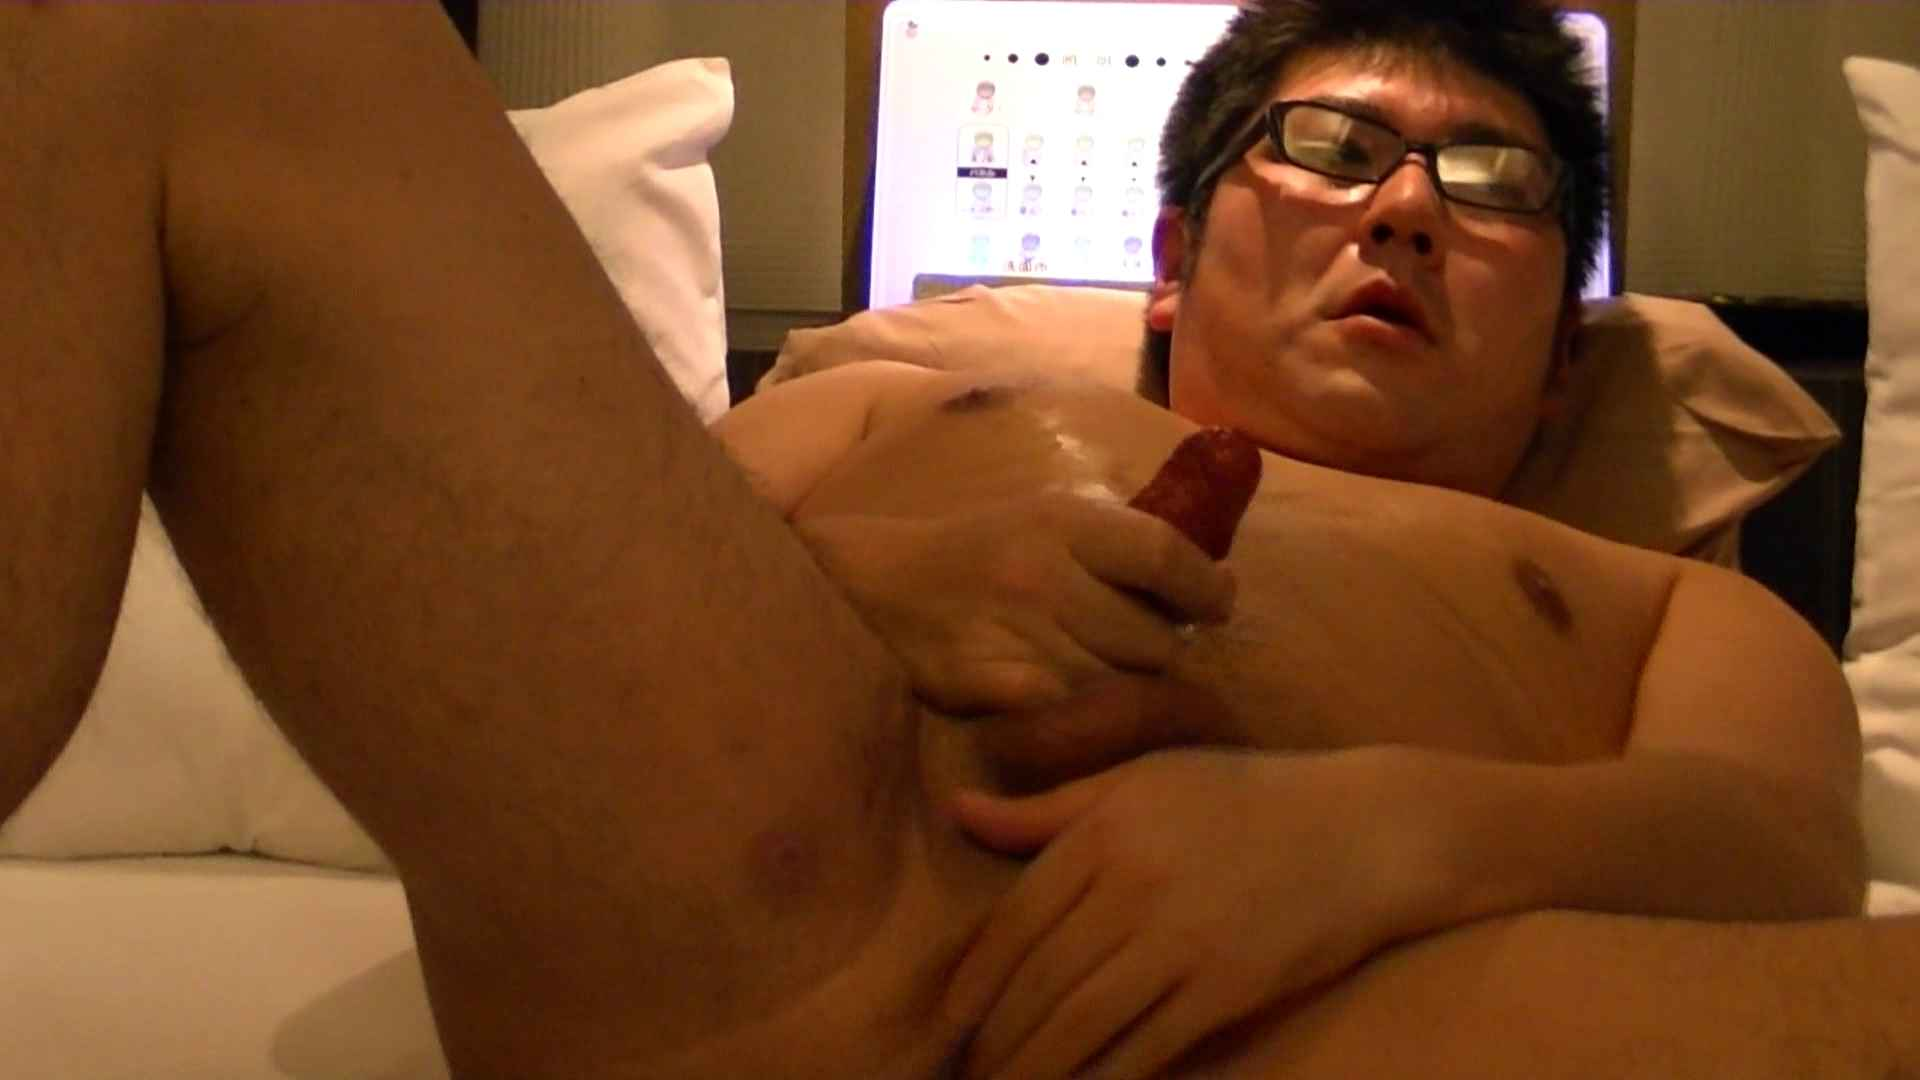 Mr.オナックスさん投稿!HD 貴方のオナニー三万円で撮影させてください。VOL.03 後編 完全無修正でお届け | オナニー特集  83pic 70